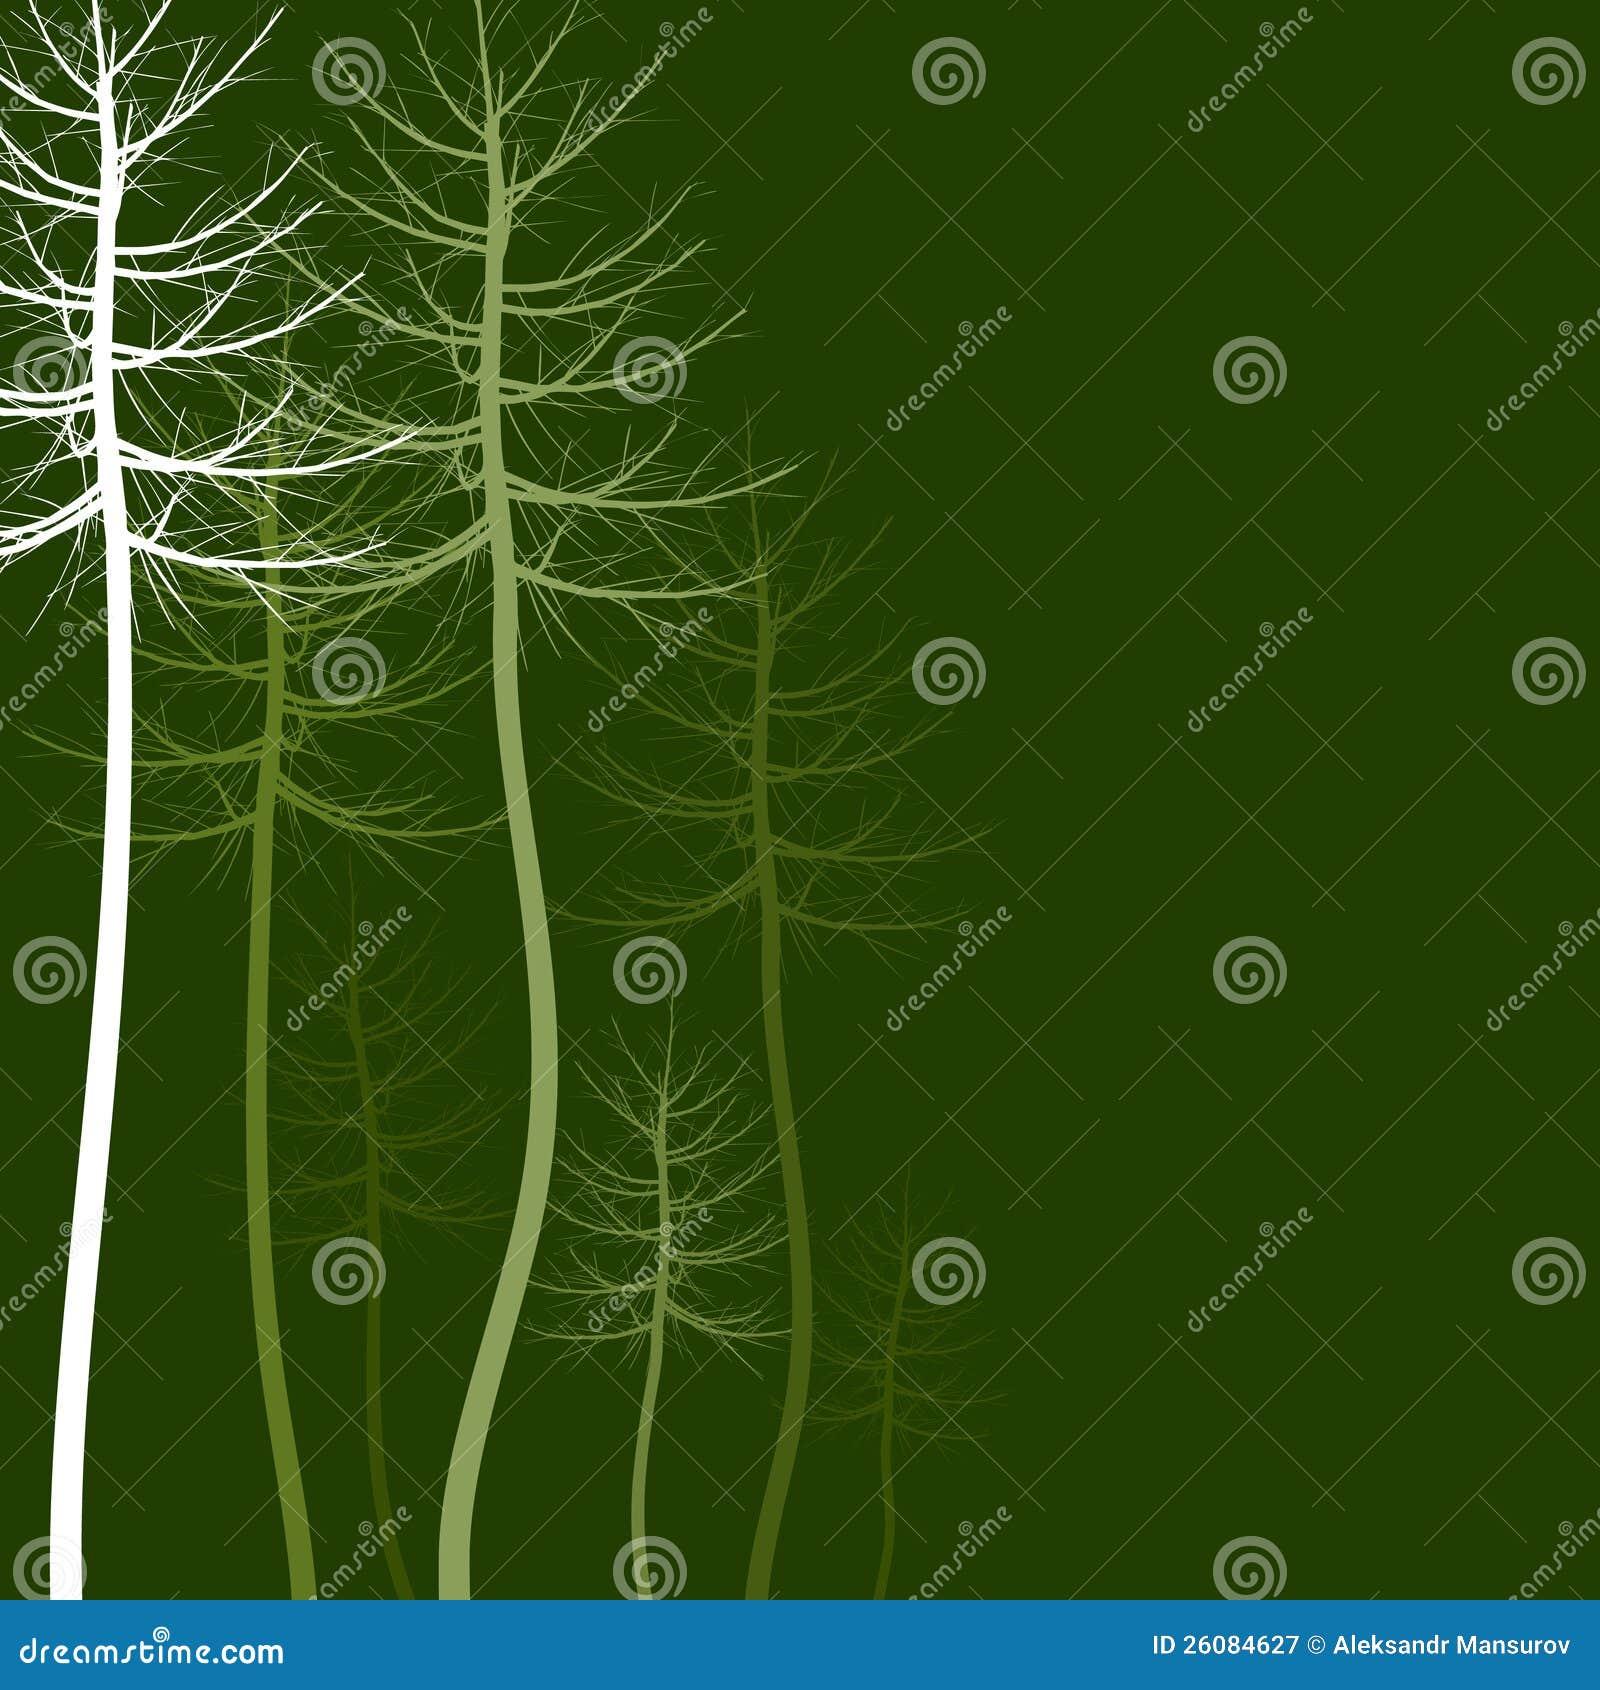 Abstract tree5